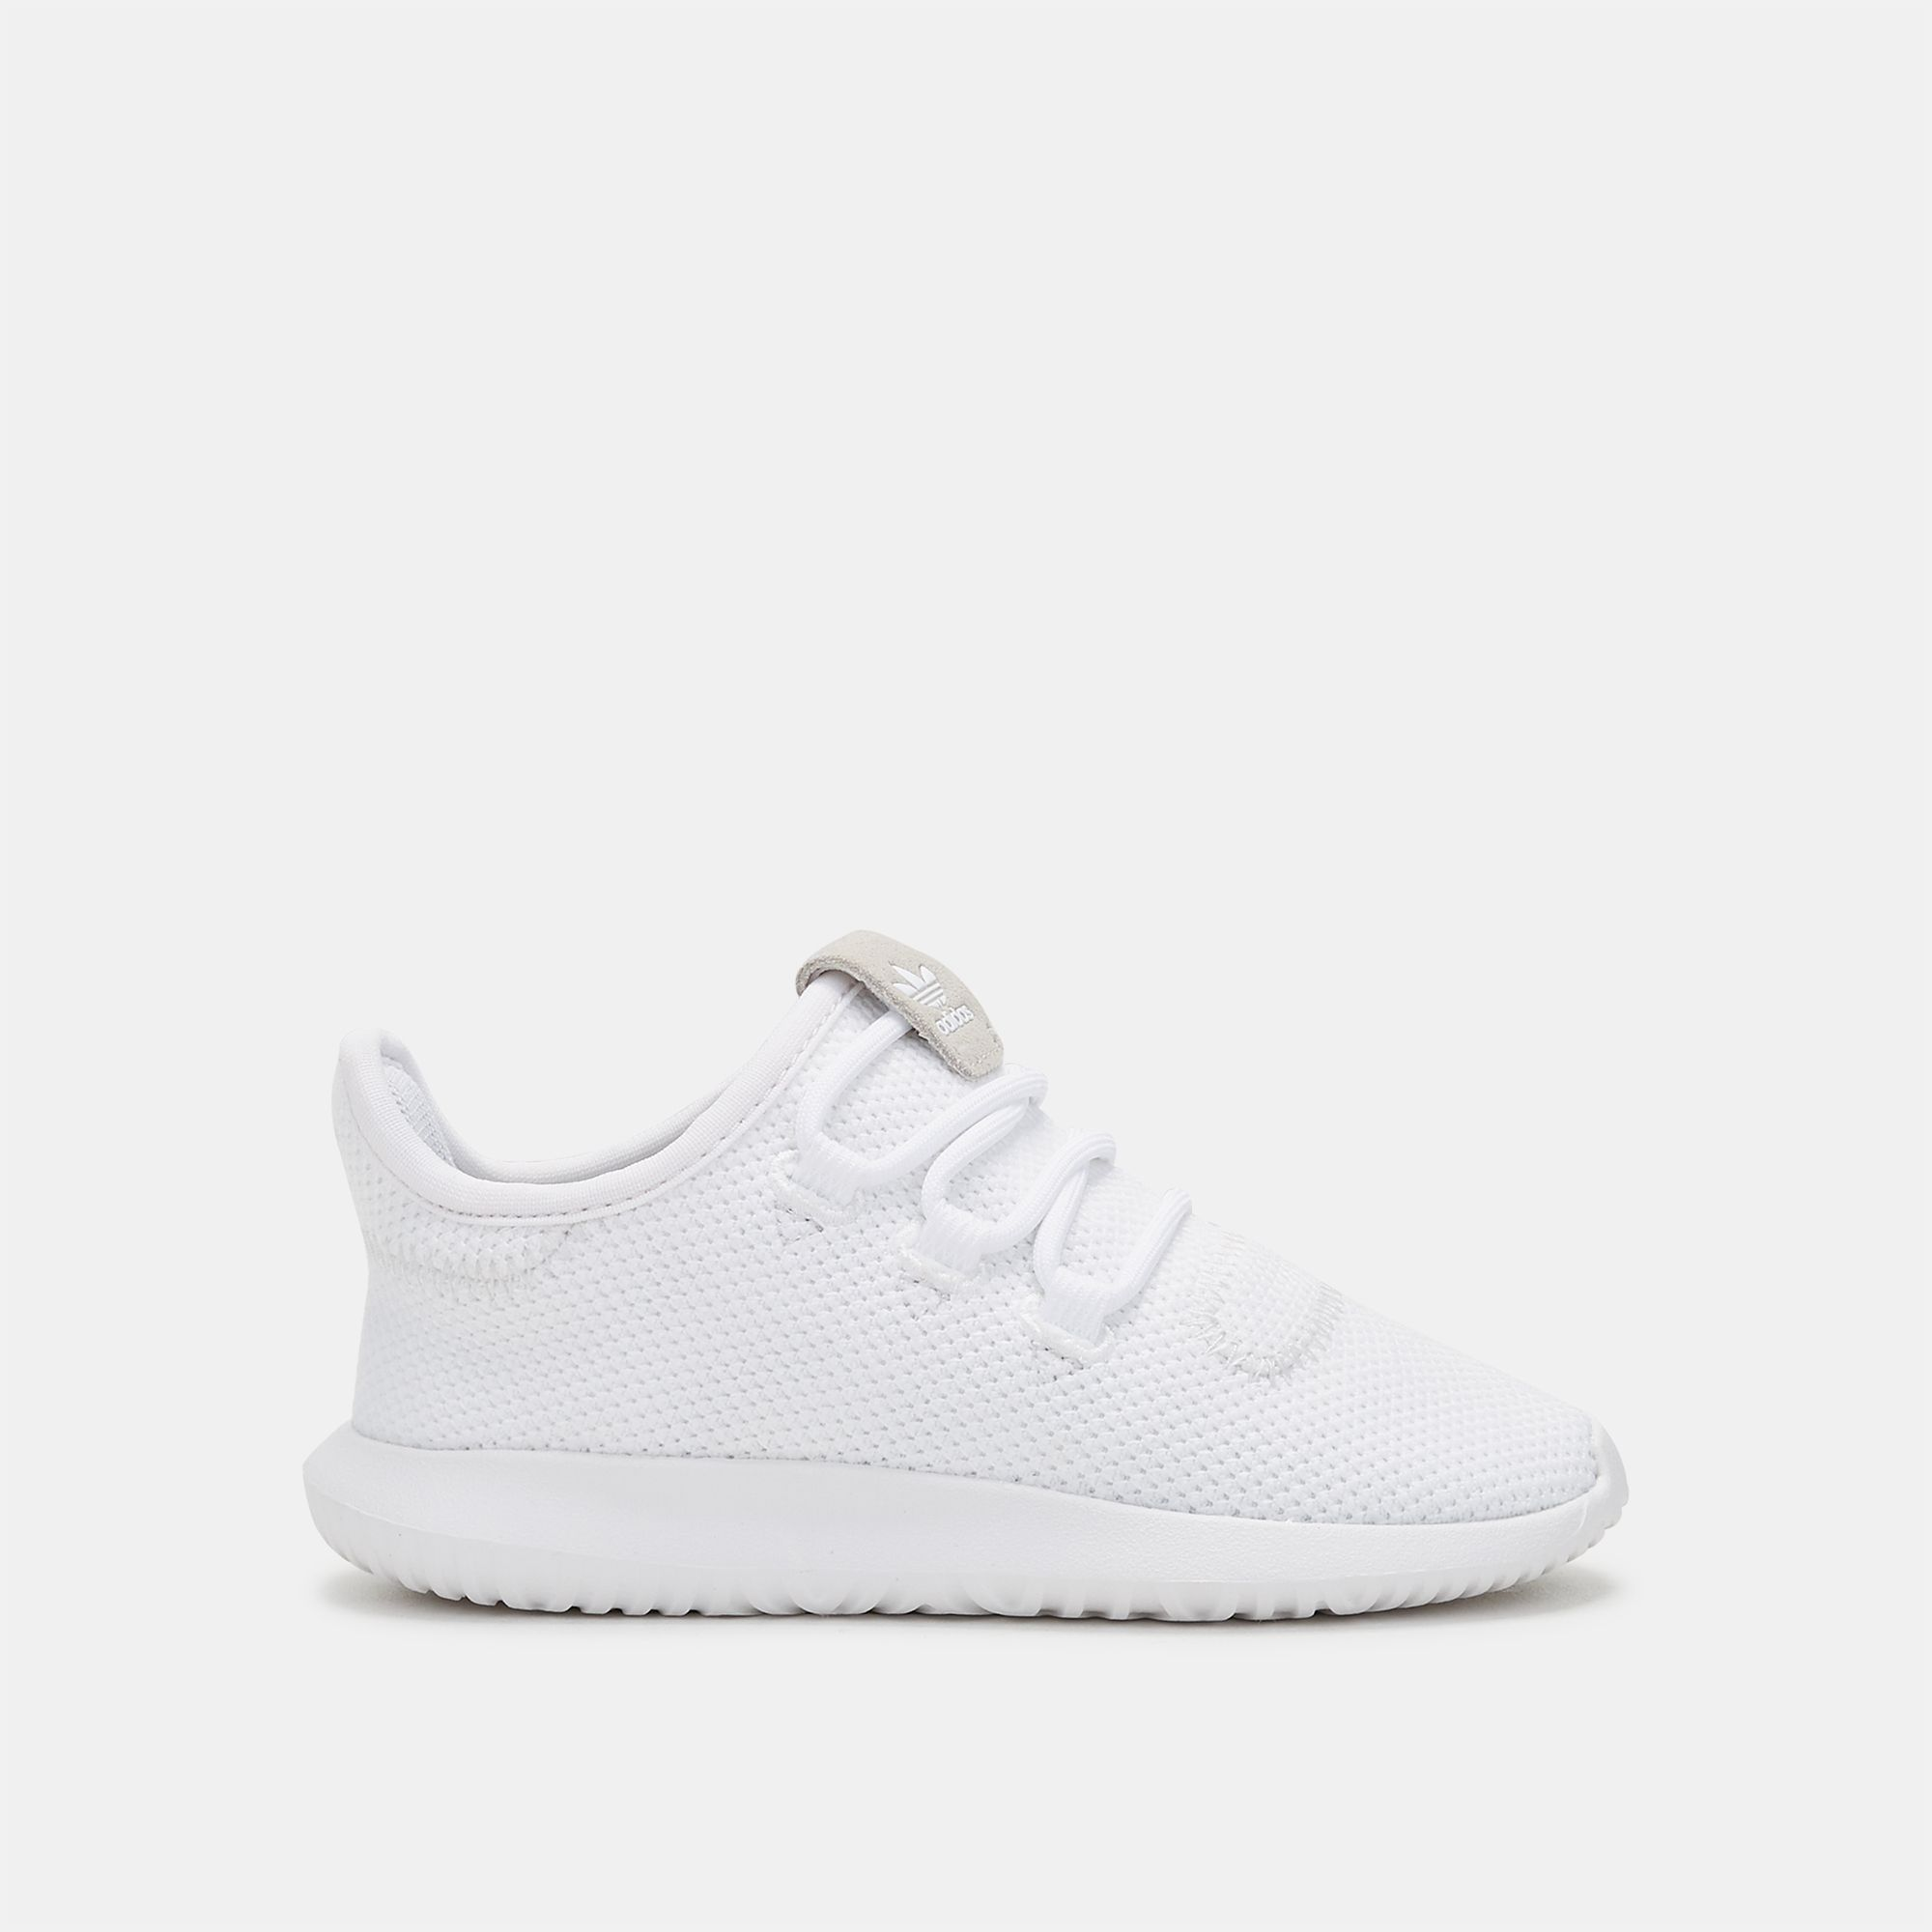 719181e5069f Shop White adidas Originals Kids  Tubular Shadow Shoe for Kids by ...